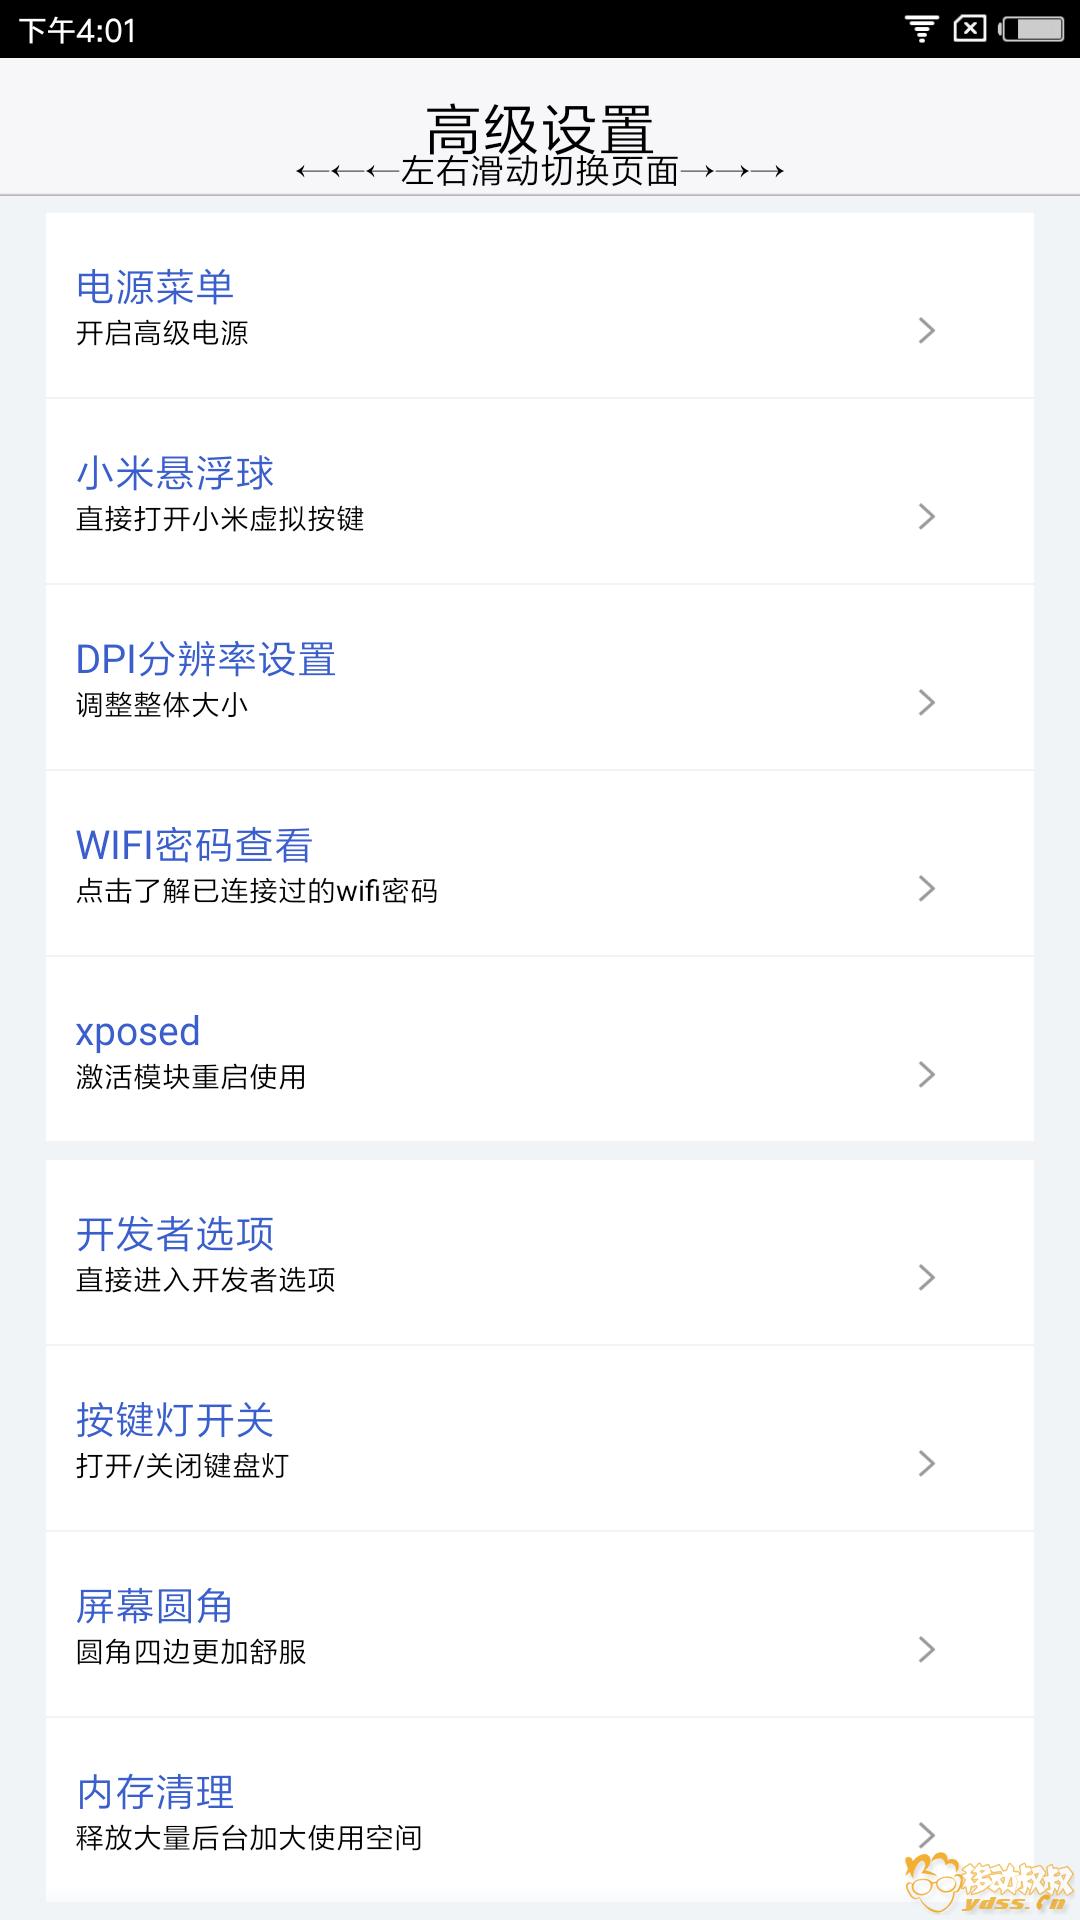 Screenshot_2018-04-10-16-01-09-982_com.pingfan.settings.png